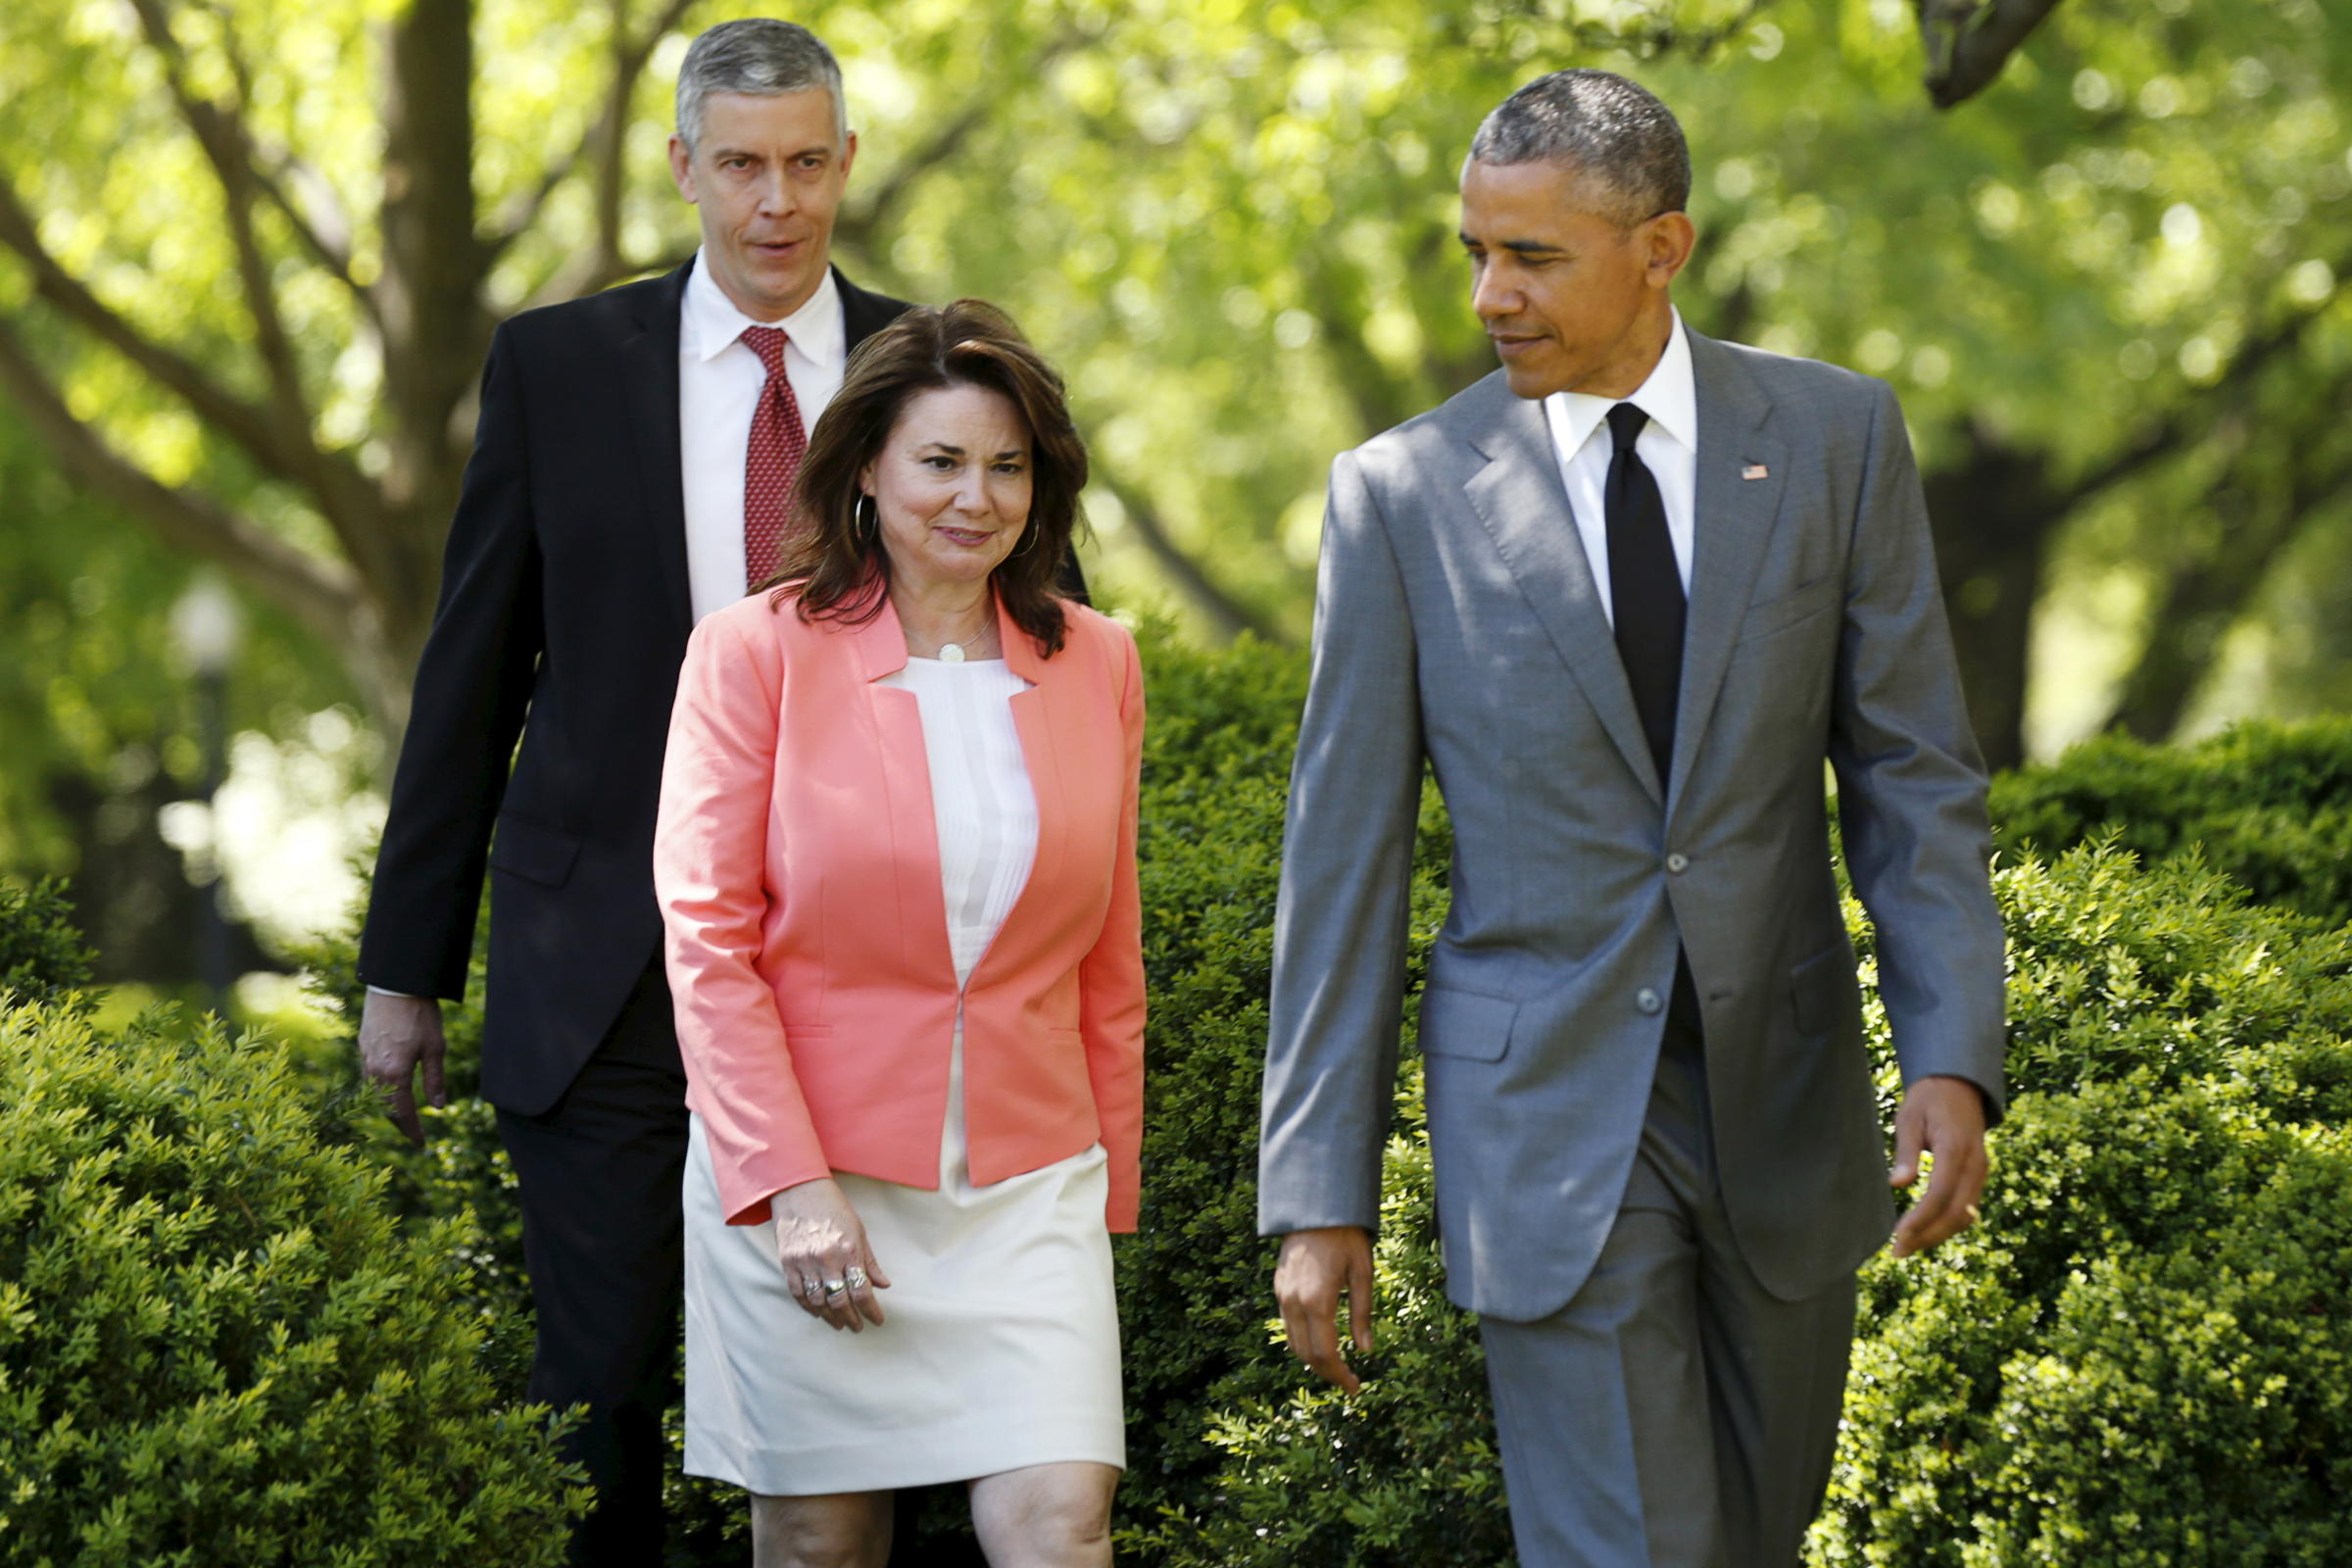 President Obama escorts 2015 National Teacher of the Year winner Shanna  Peeples into the Rose Garden